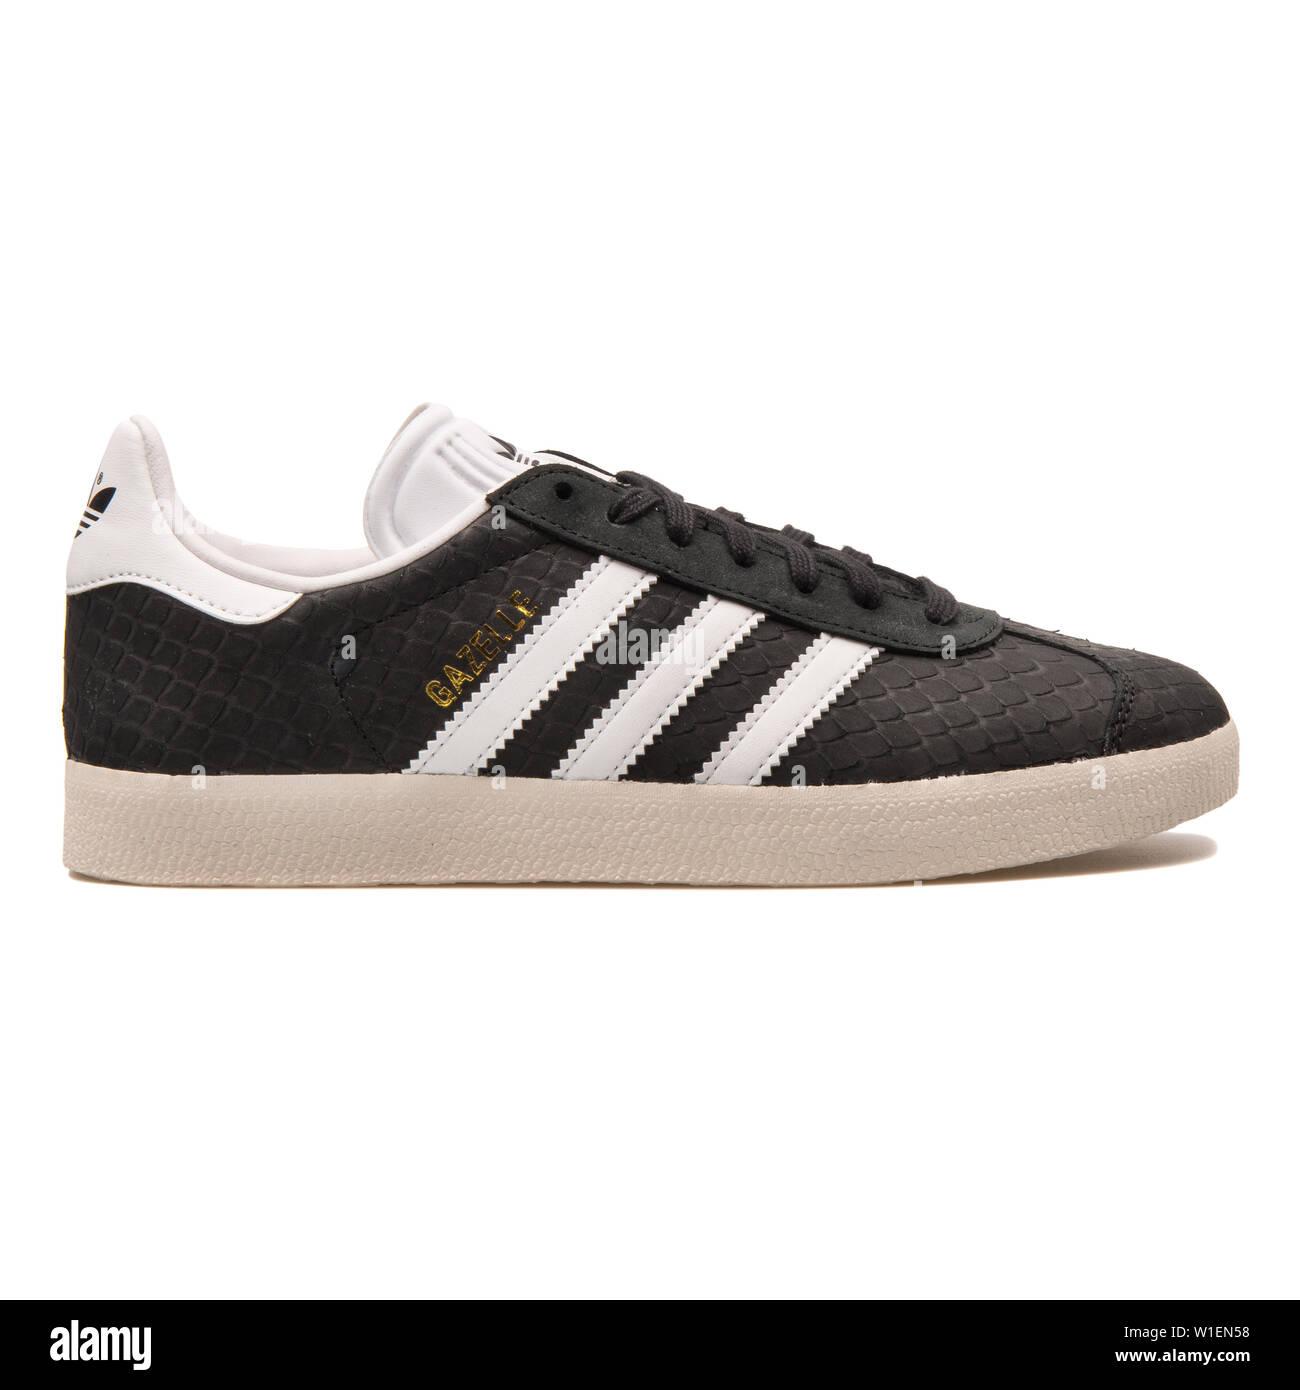 75f0a001 VIENNA, AUSTRIA - AUGUST 30, 2017: Adidas Gazelle black and white sneaker on